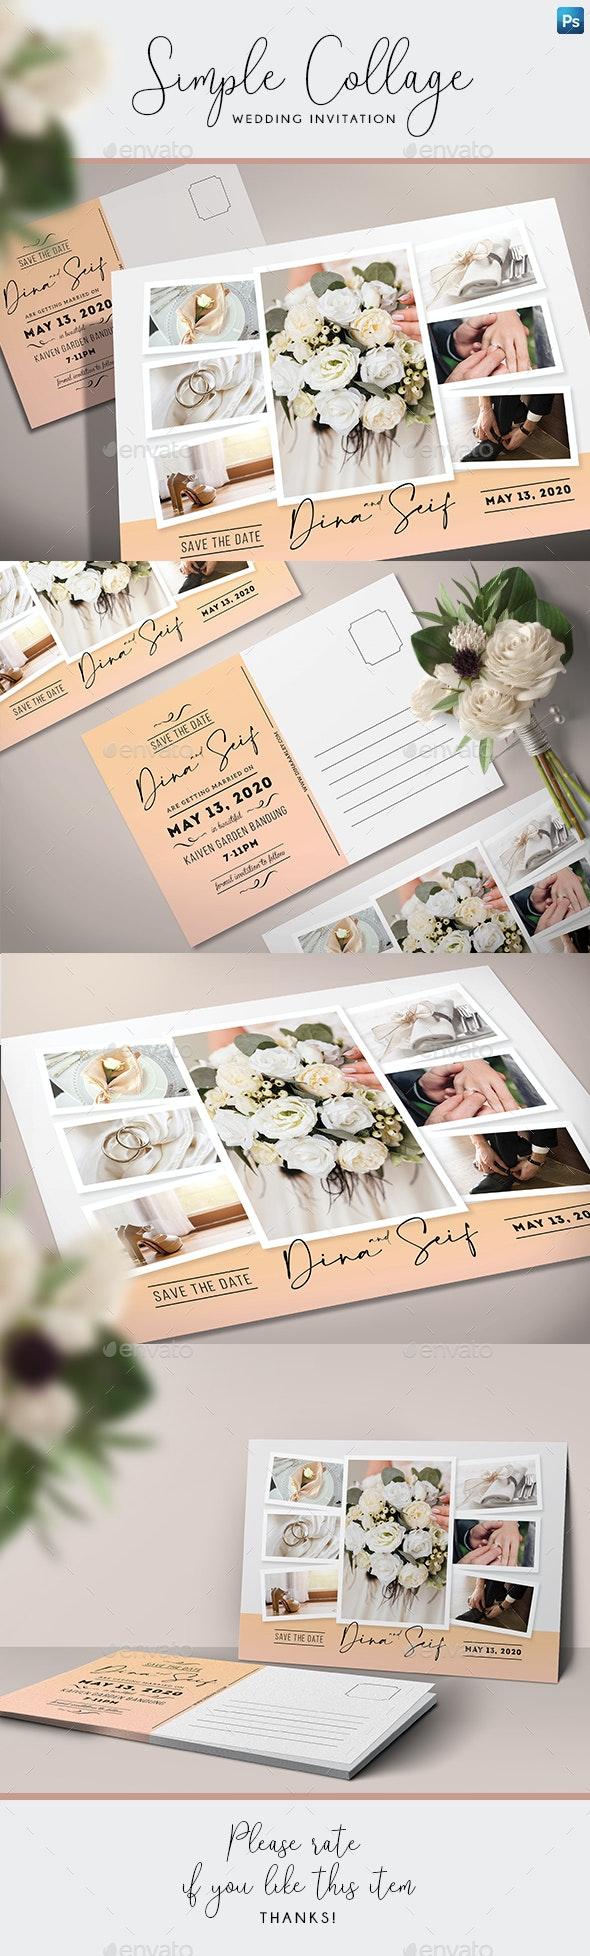 Simple Collage Invitation - Weddings Cards & Invites